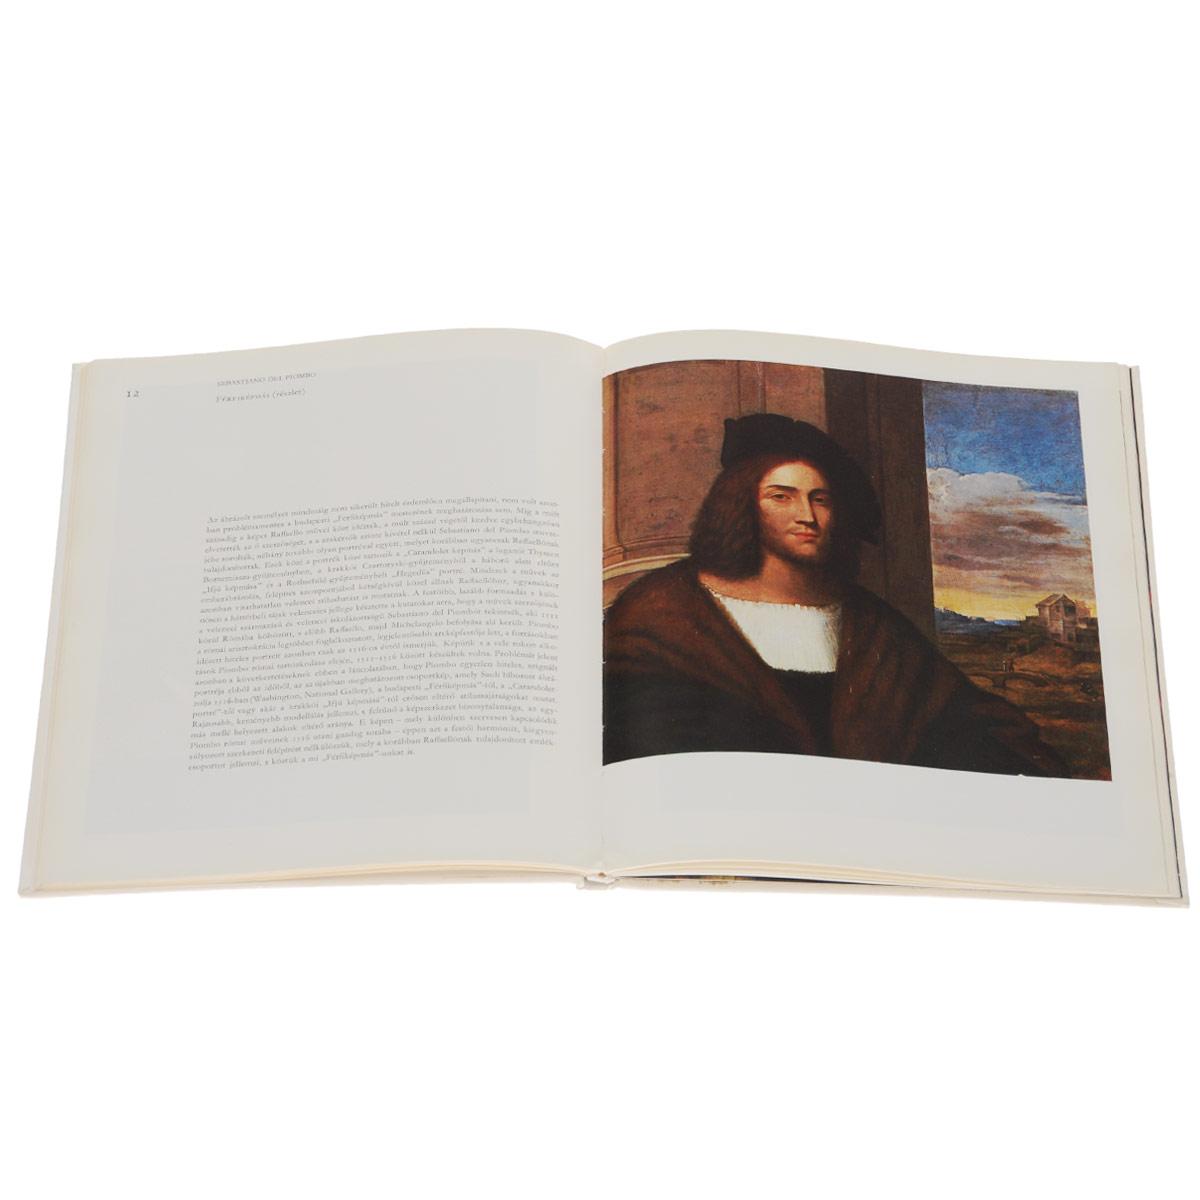 Olasz reneszansz portrek